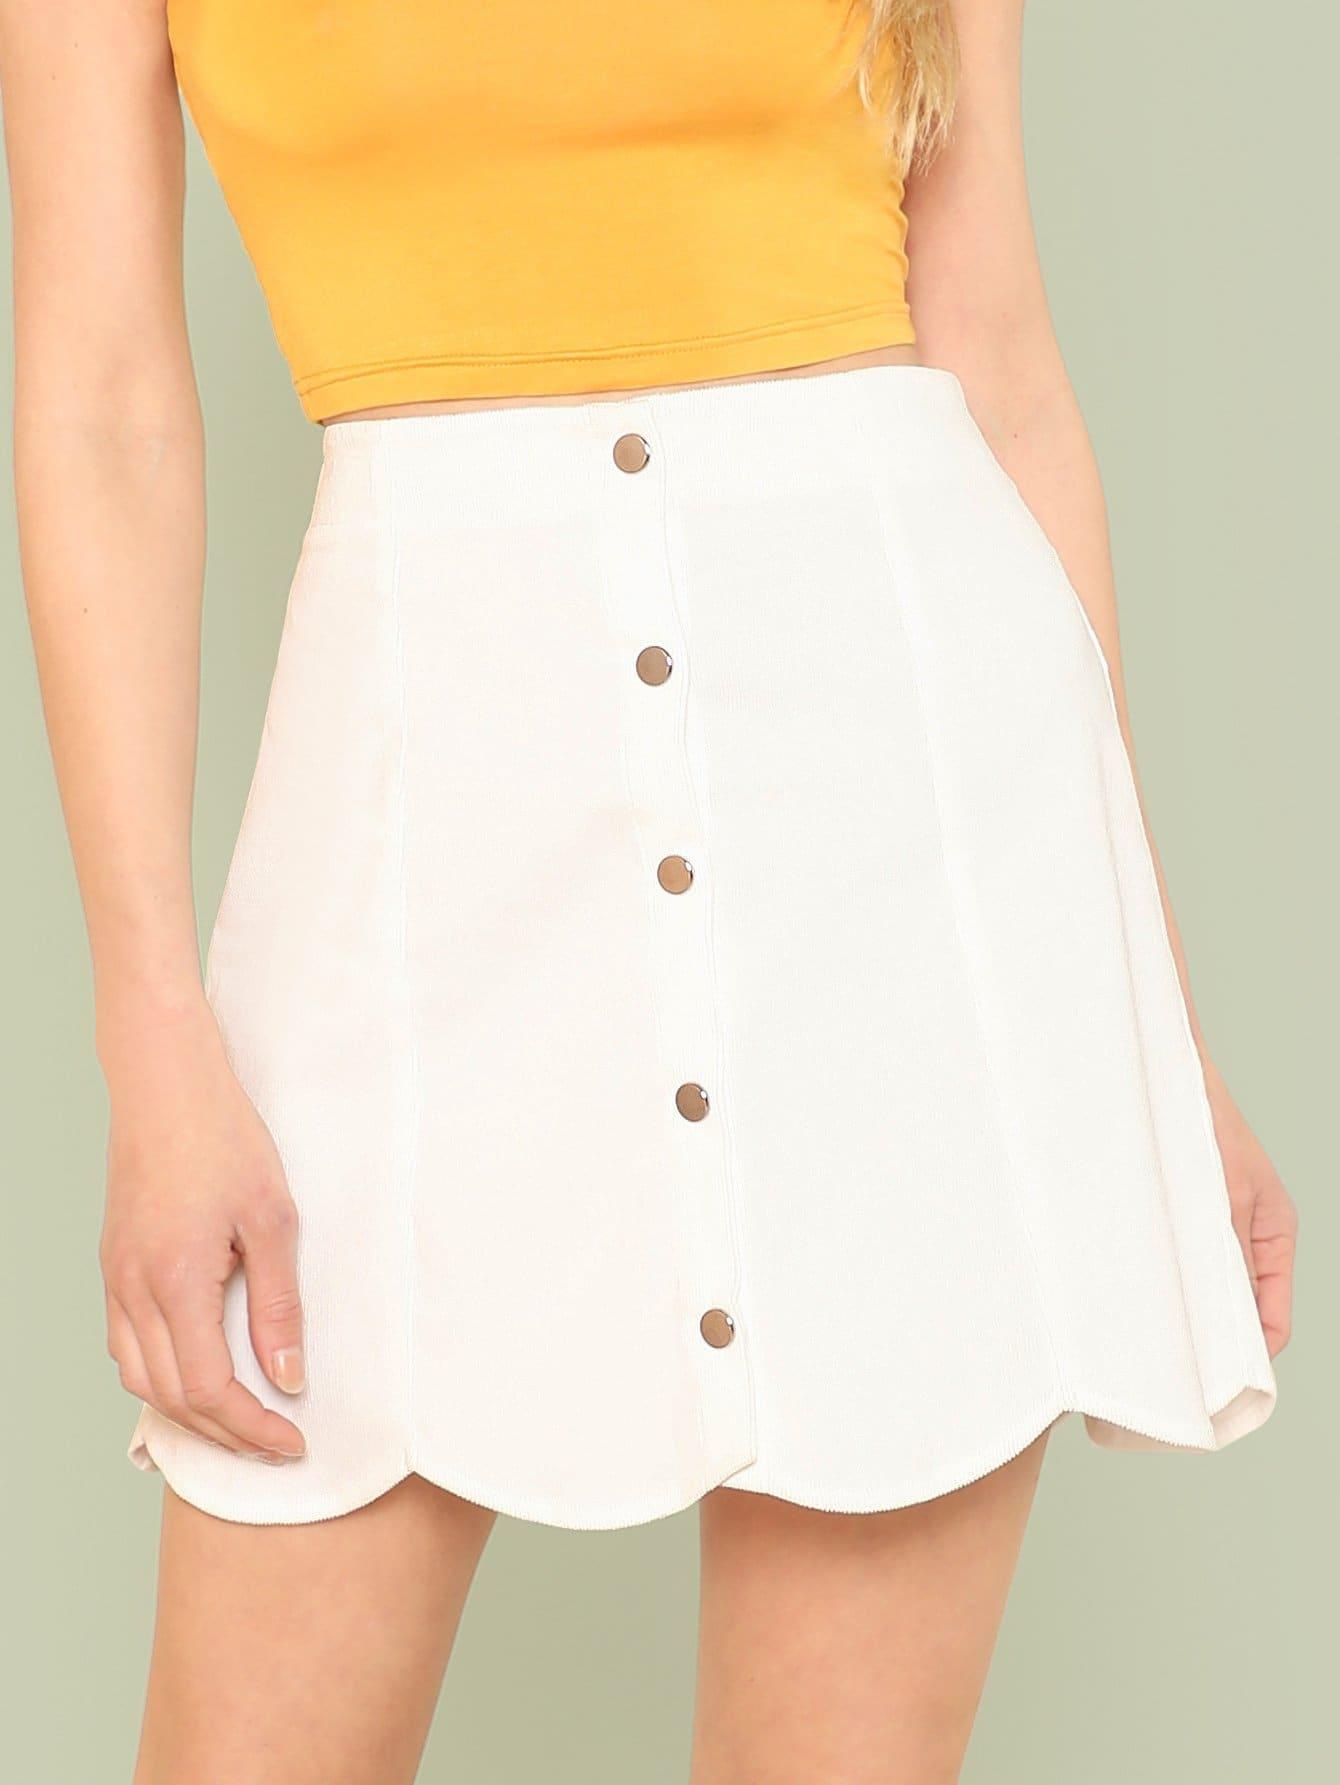 Button Detail Scallop Trim Skirt gold button detail bodycon skirt